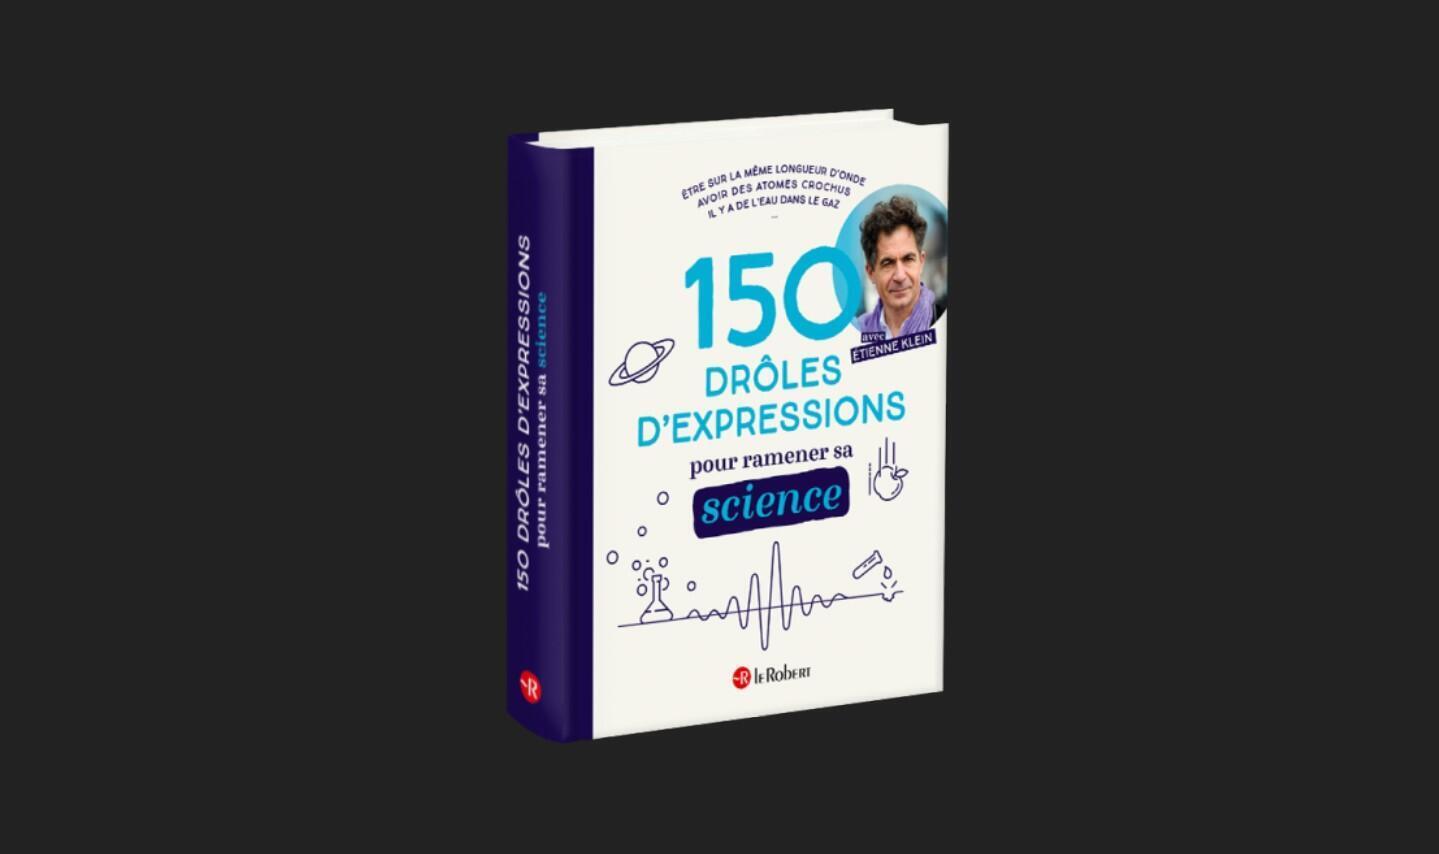 150 drôles d'expressions pour ramener sa science